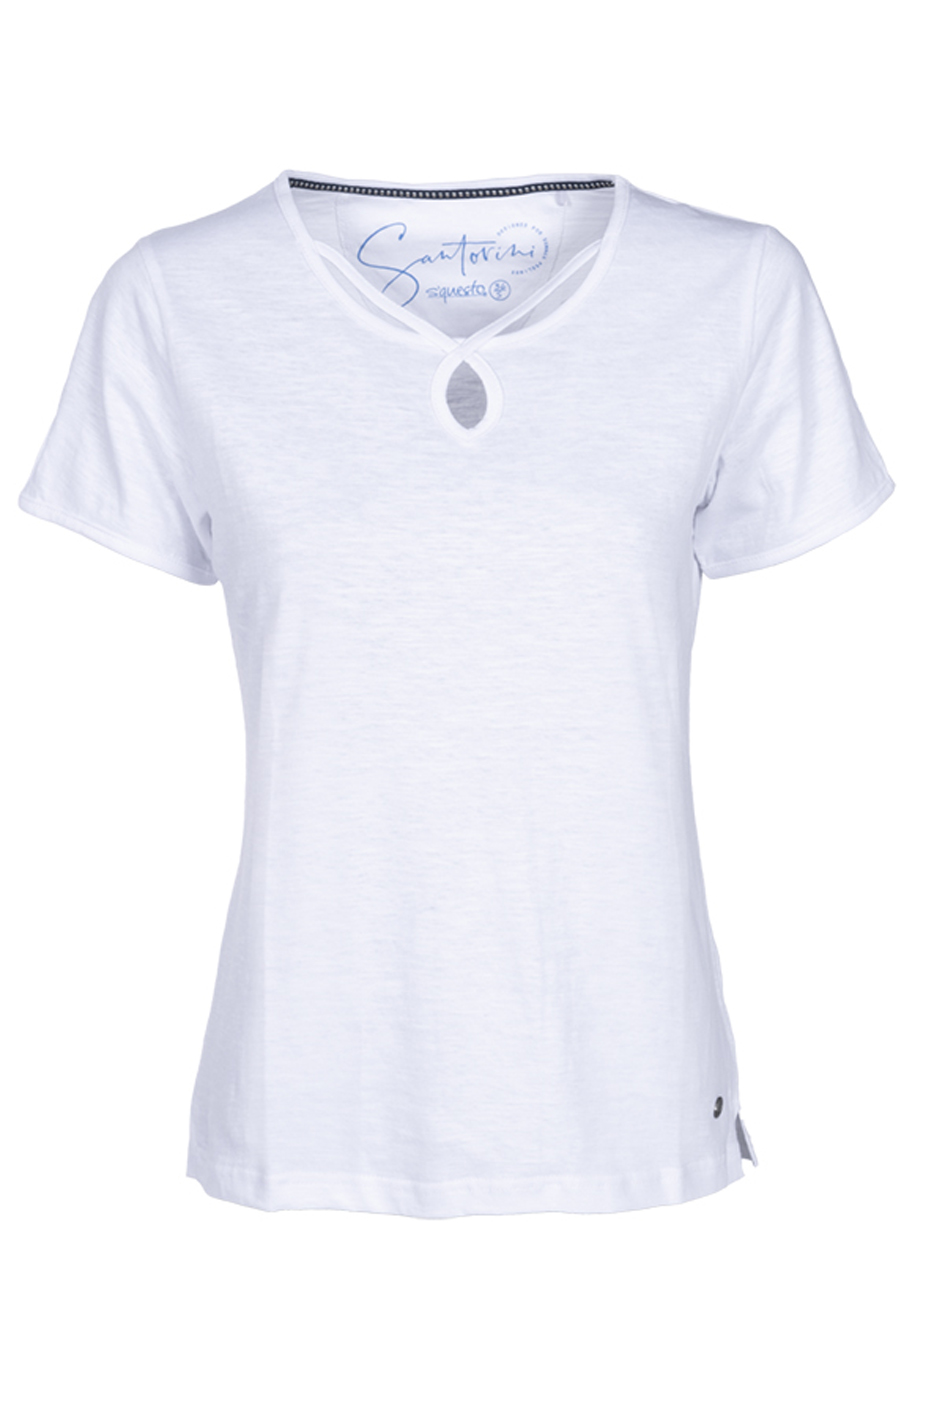 Soquesto Shirt Ilvie